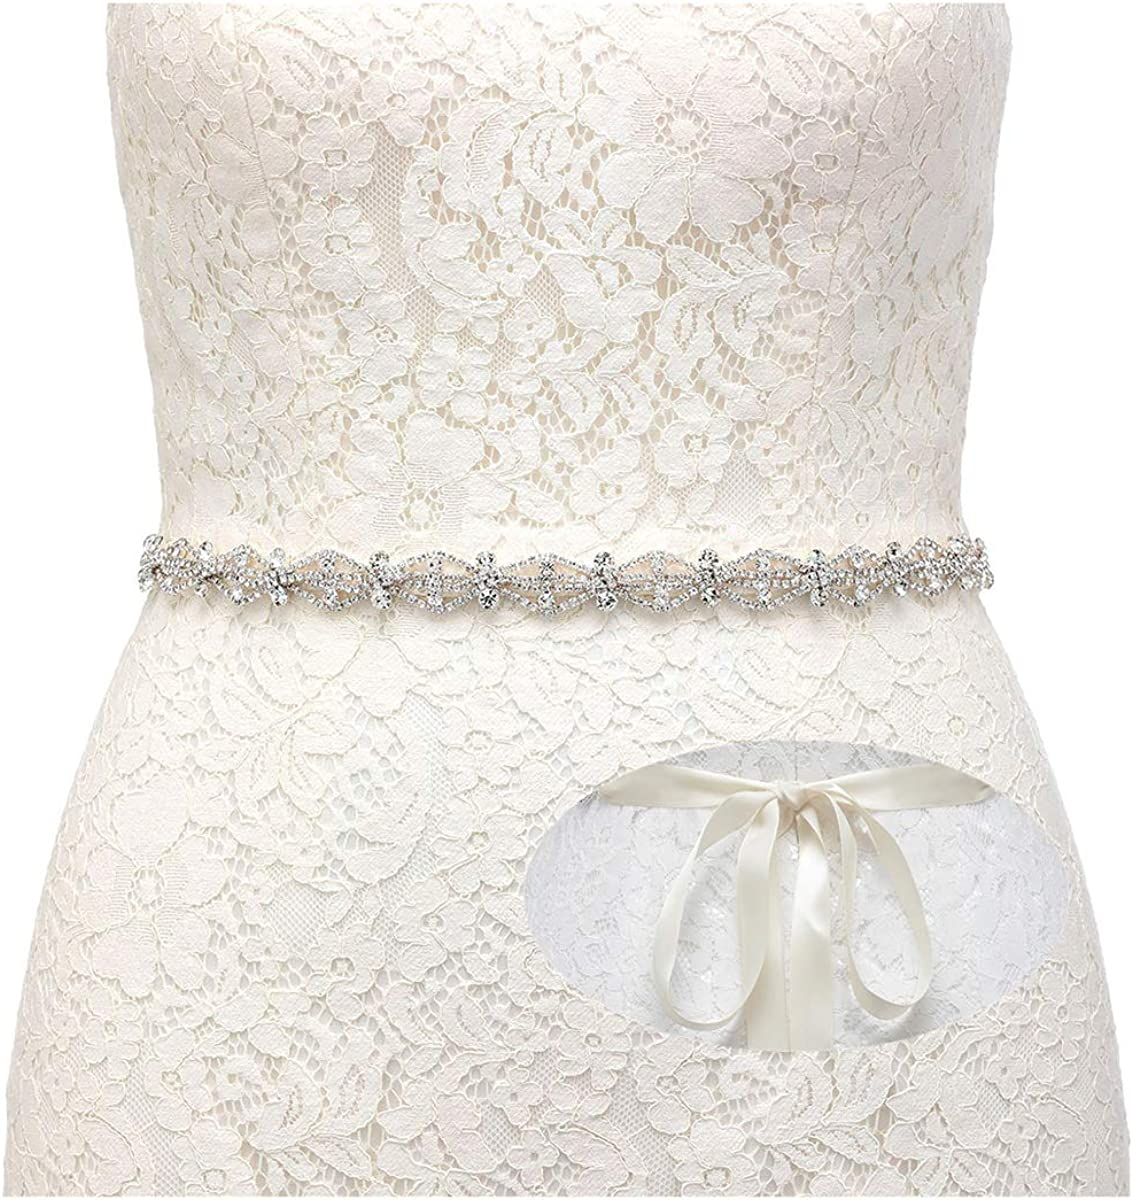 SWEETV Crystal Bridal Belt Rhinestone Wedding Dress Belt Sash Headband for Bride Bridesmaid